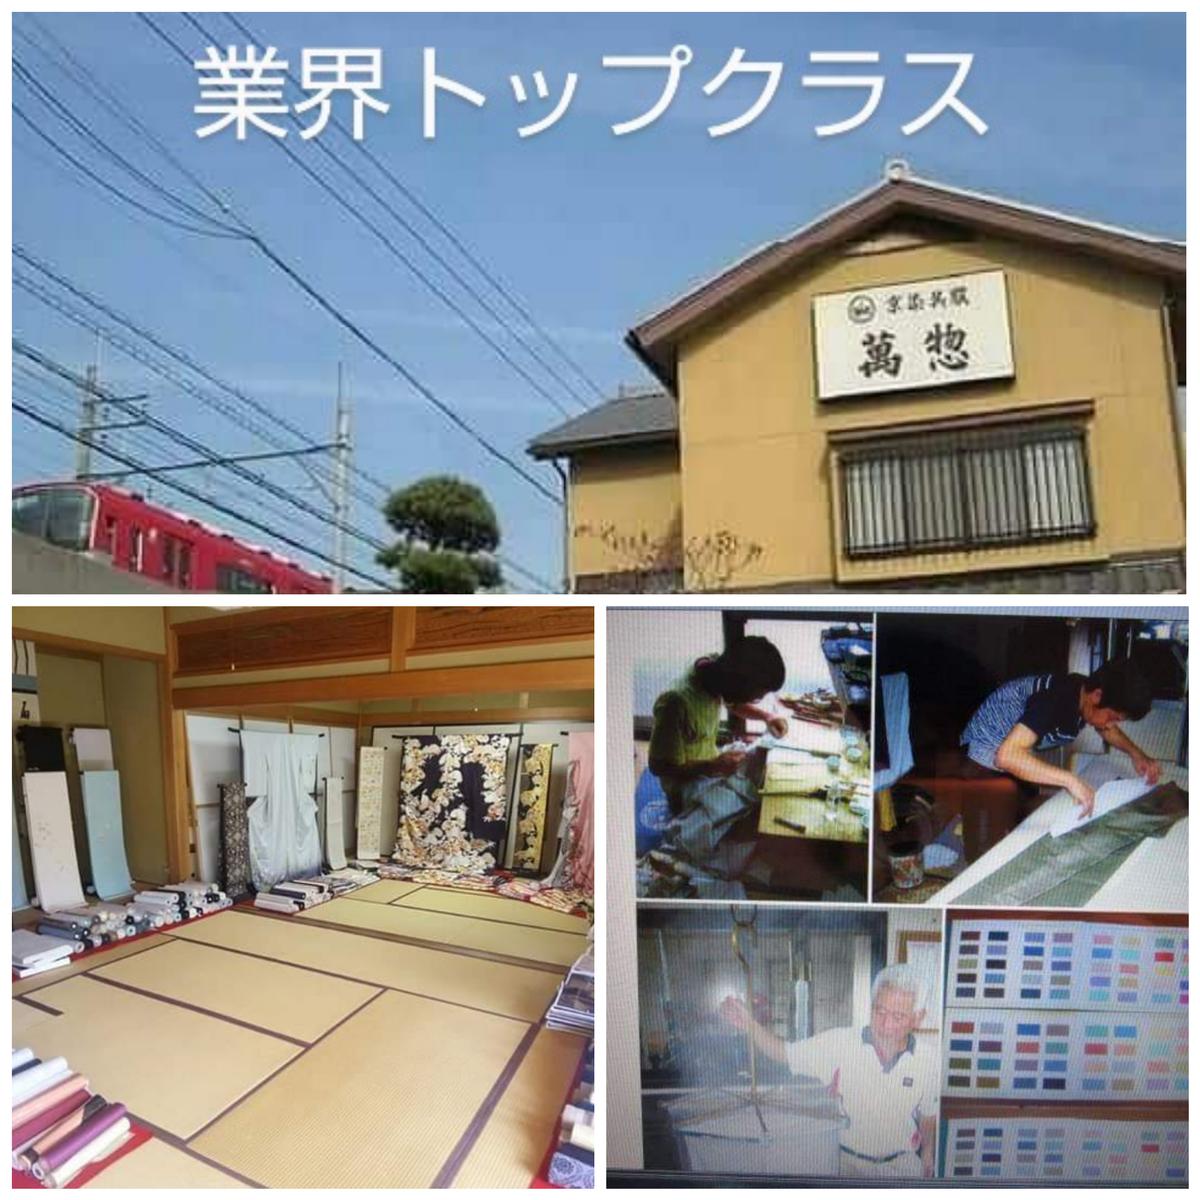 f:id:gofukumansou:20210424055101j:plain